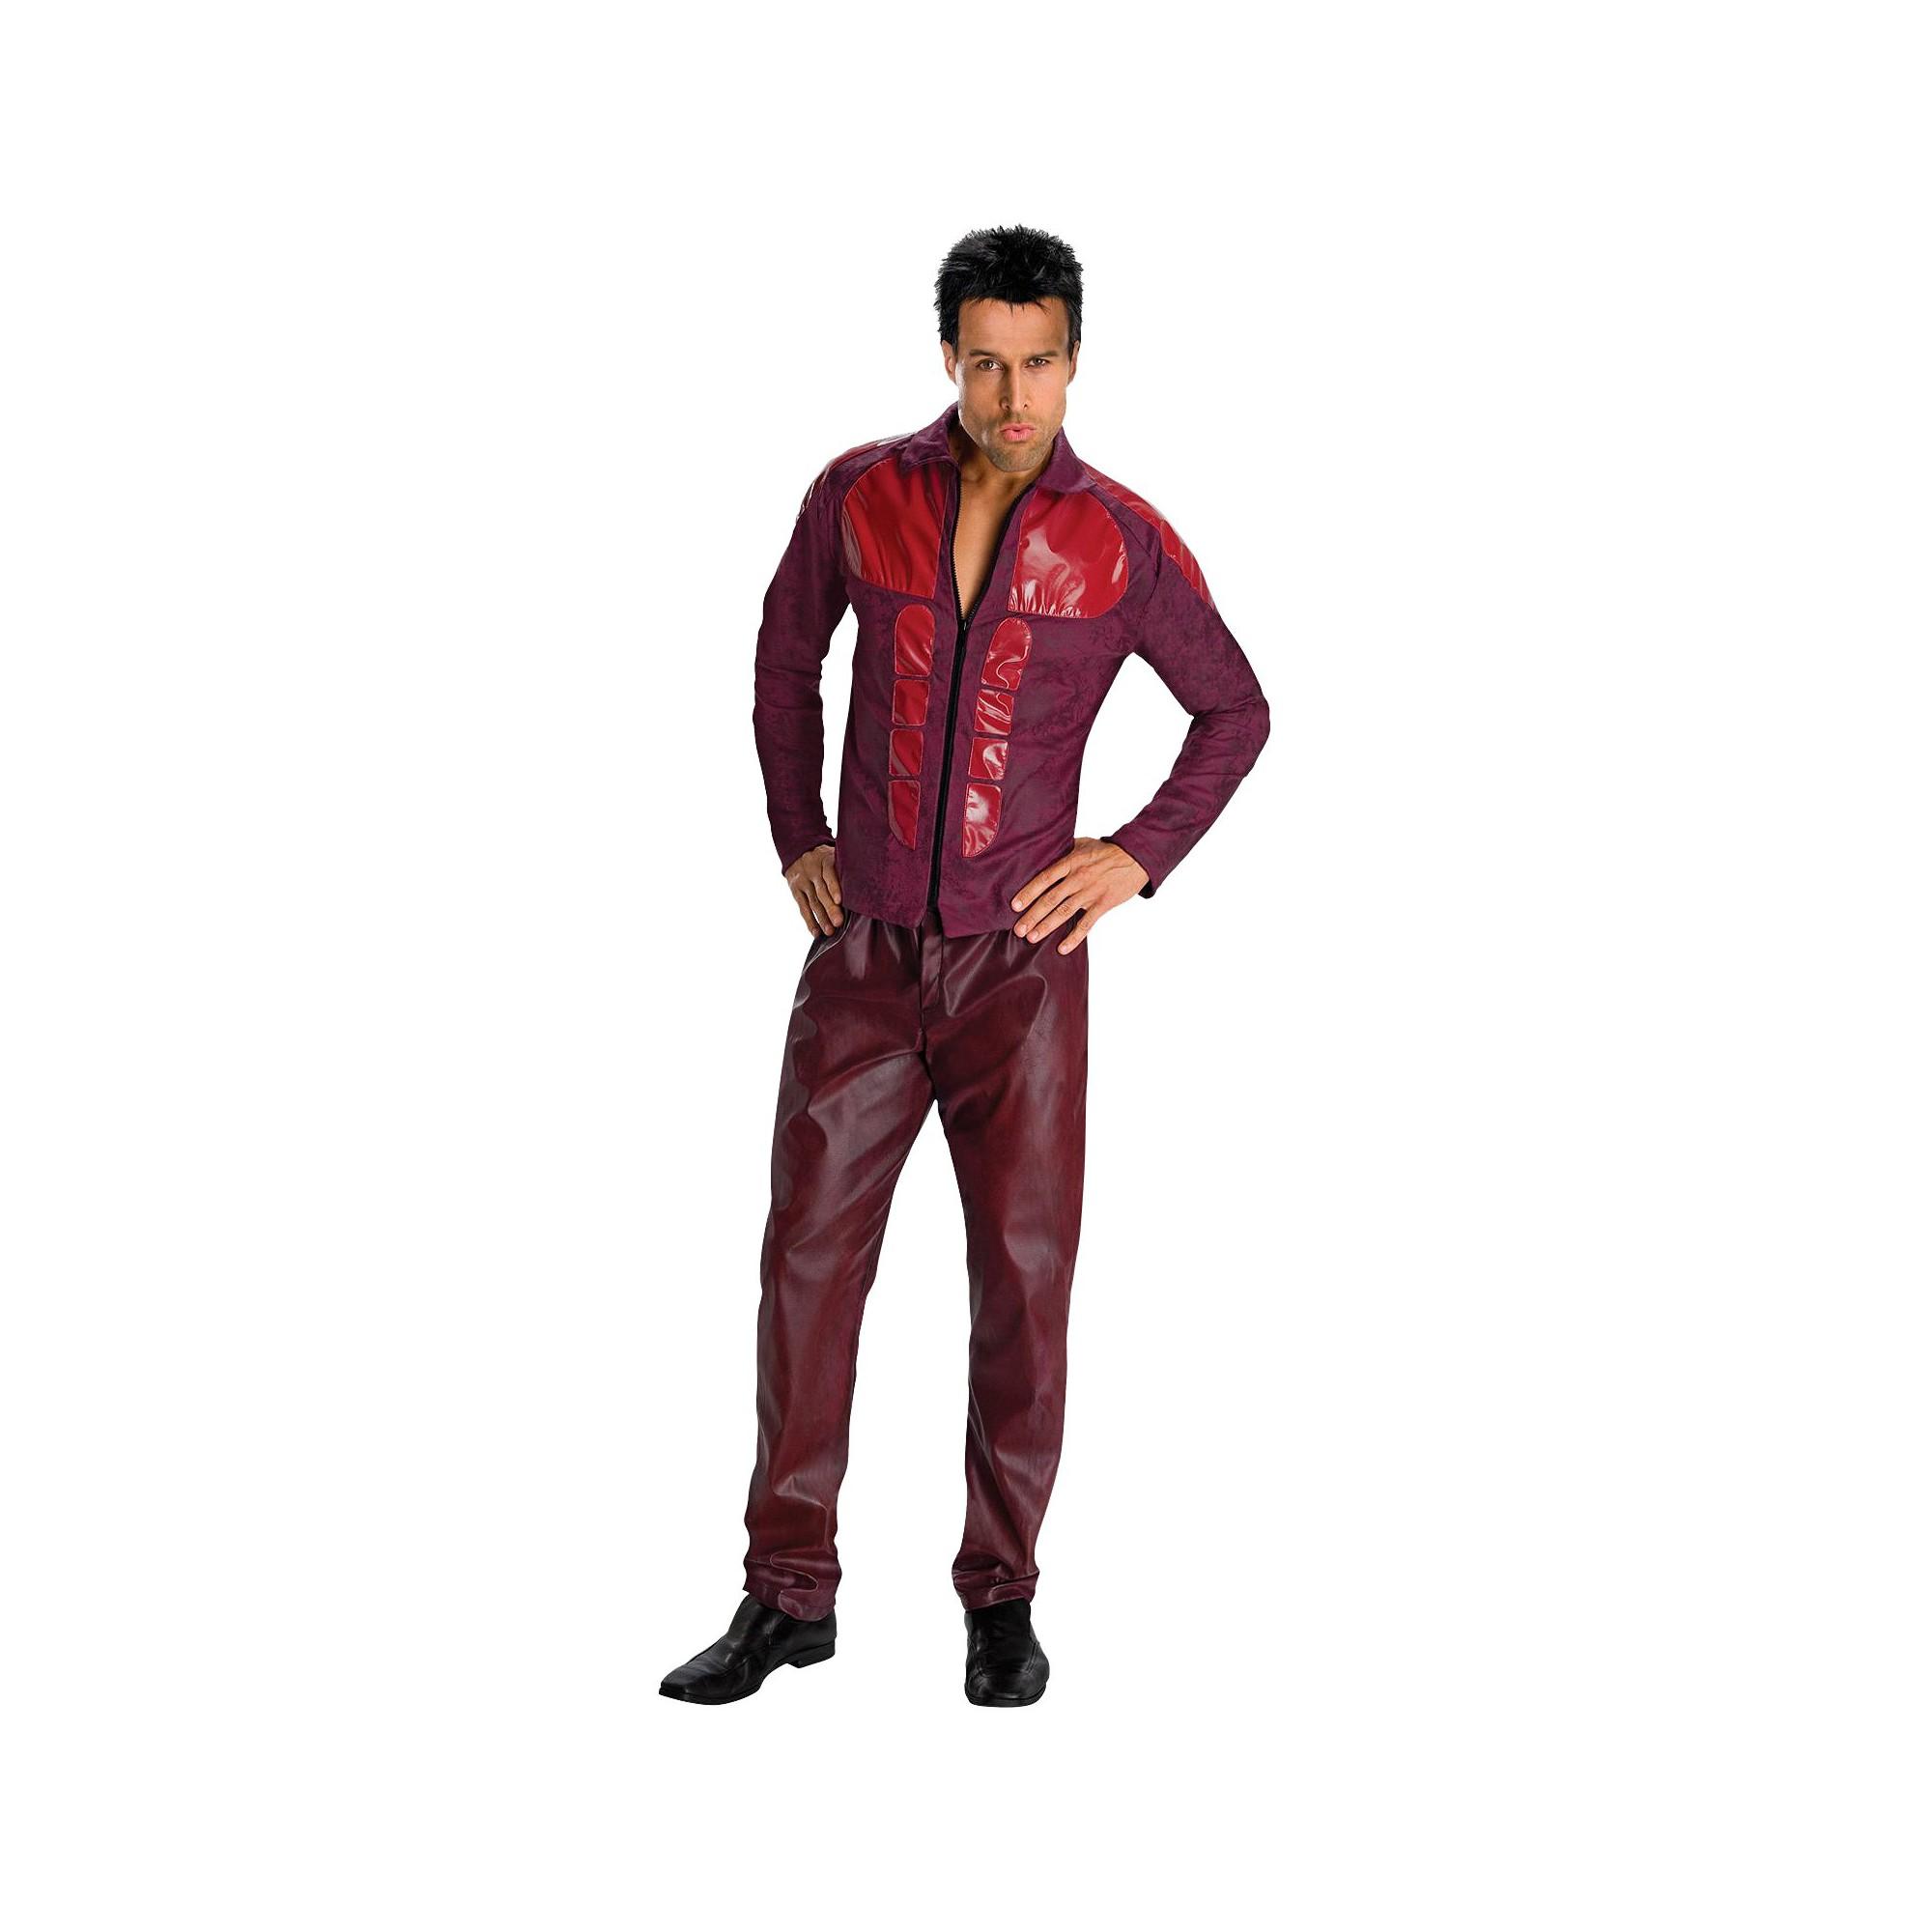 Halloween Adult Derek Zoolander Costume One Size, Men's, MultiColored